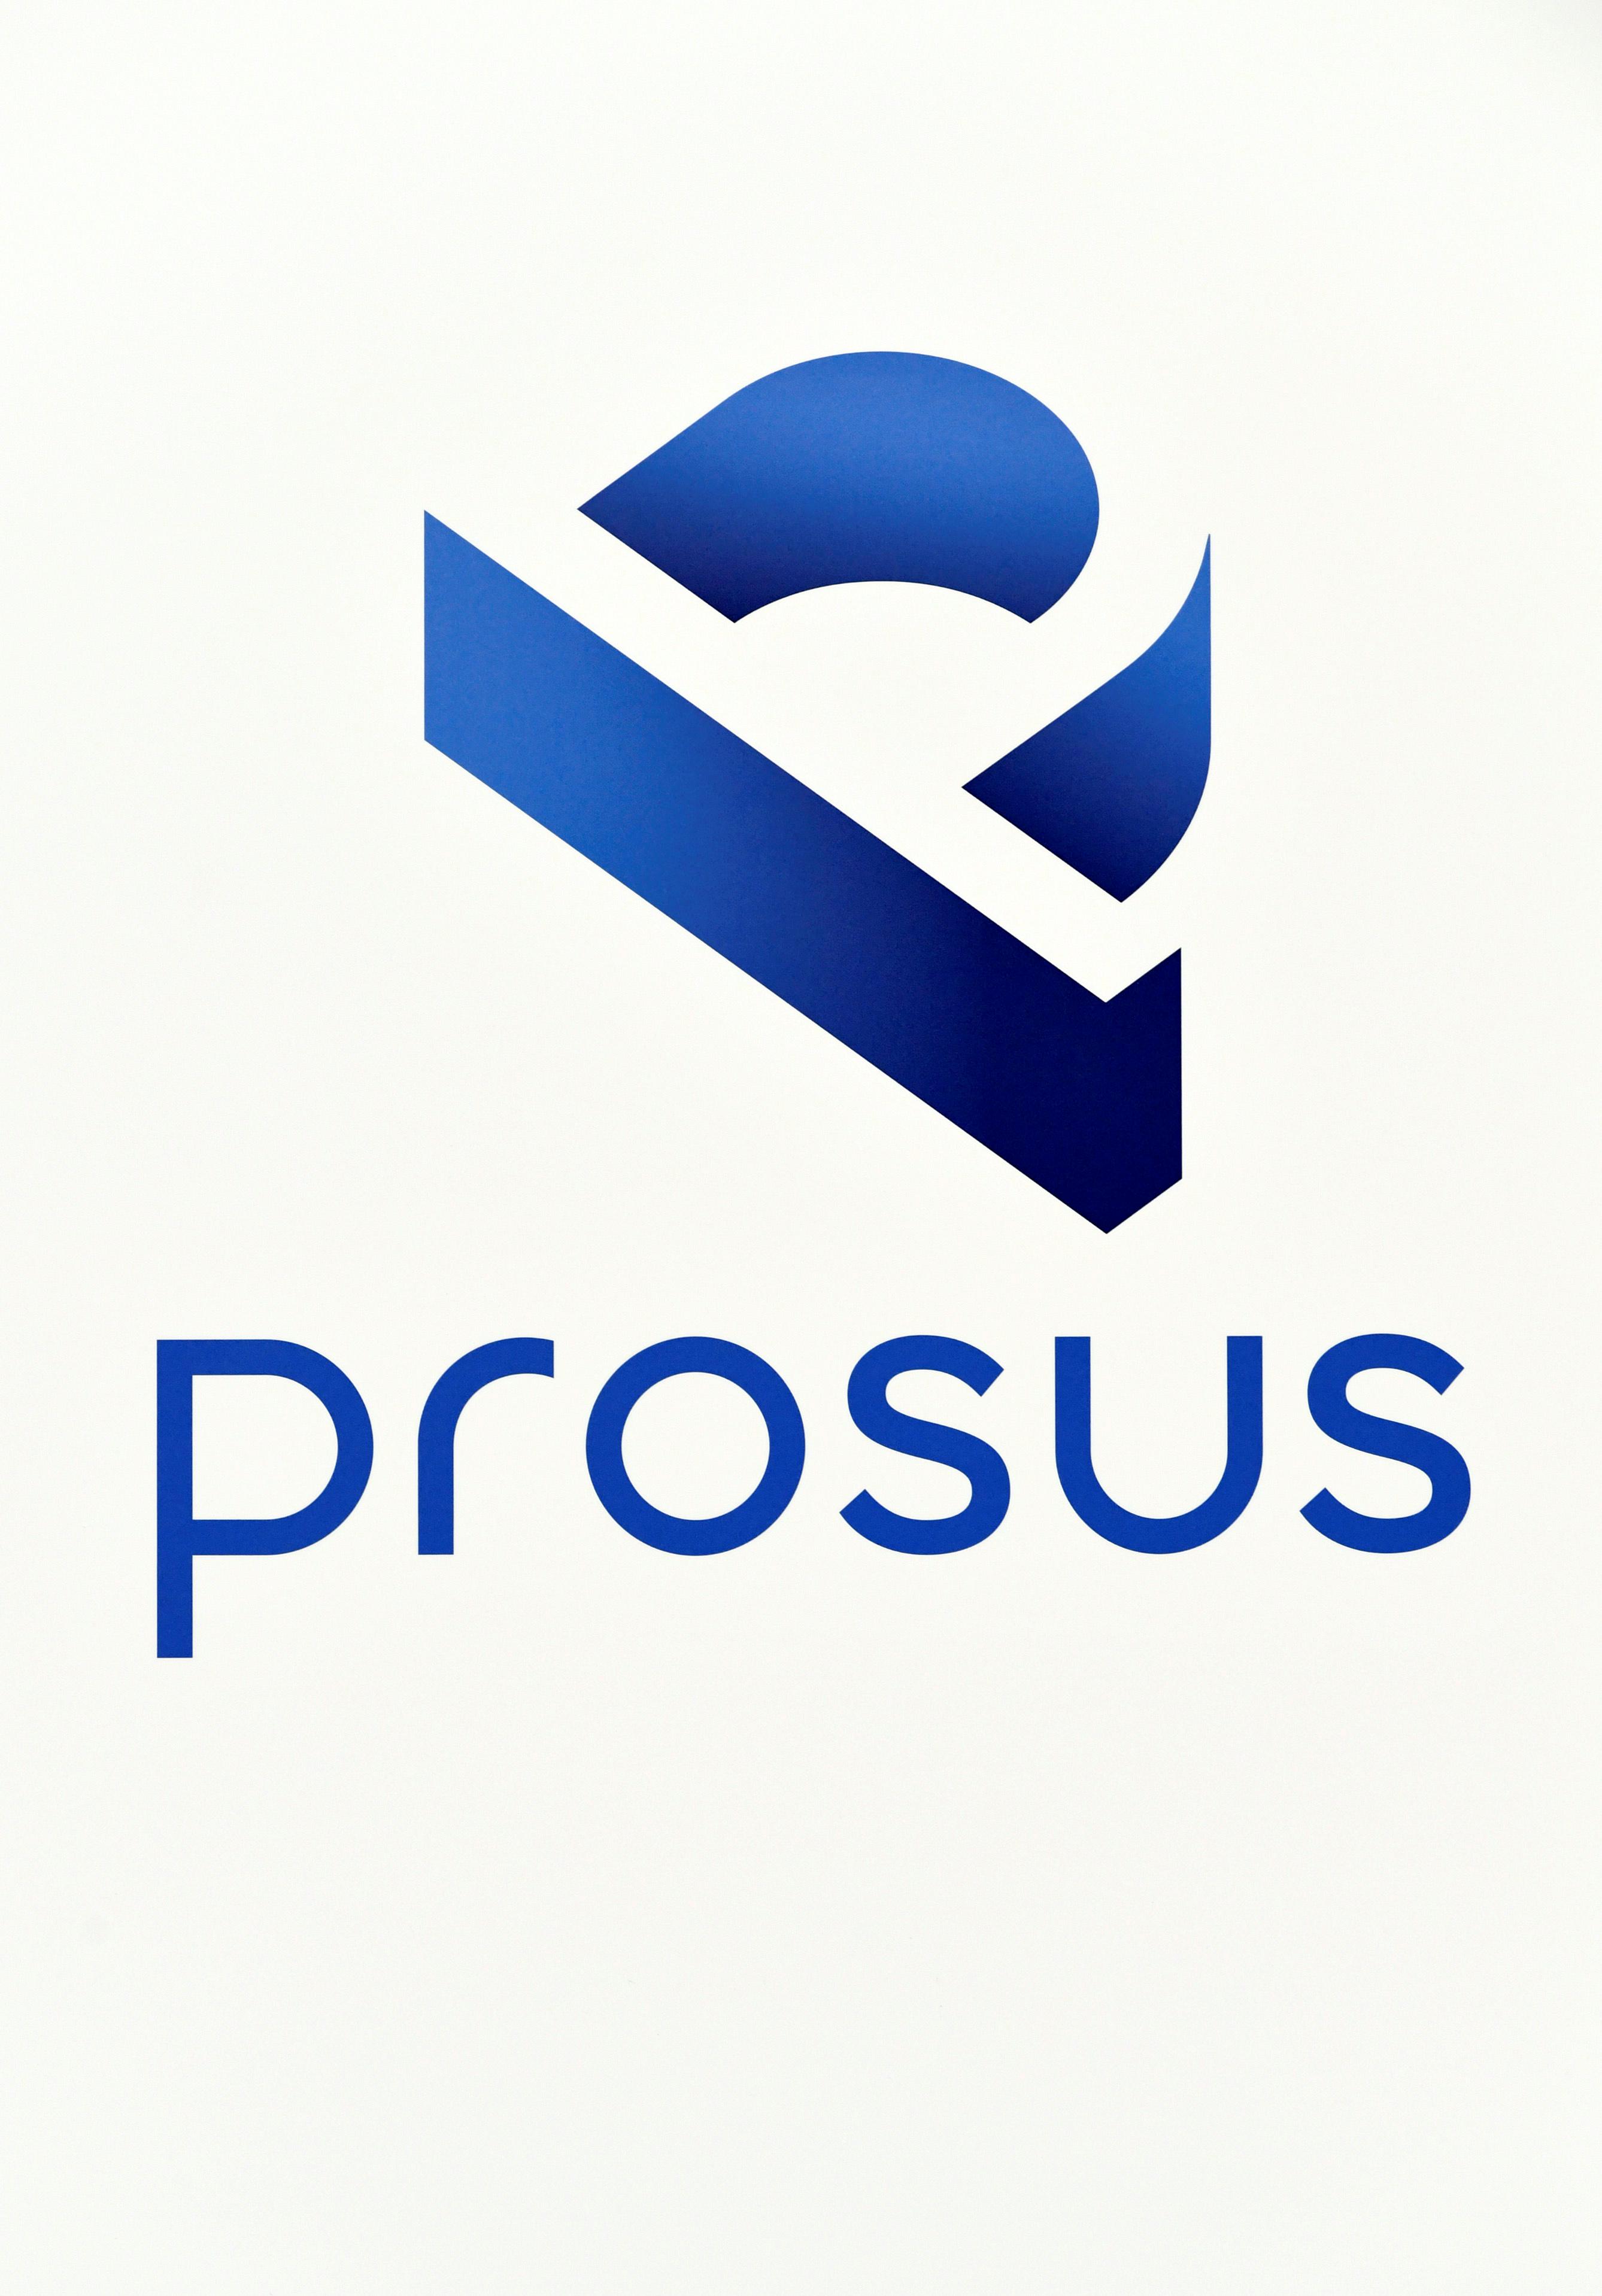 A logo of Prosus is diplayed at Amsterdam's stock exchange building as Prosus begins trading on the Euronext stock exchange in Amsterdam, Netherlands, September 11, 2019. REUTERS/Piroschka van de Wouw